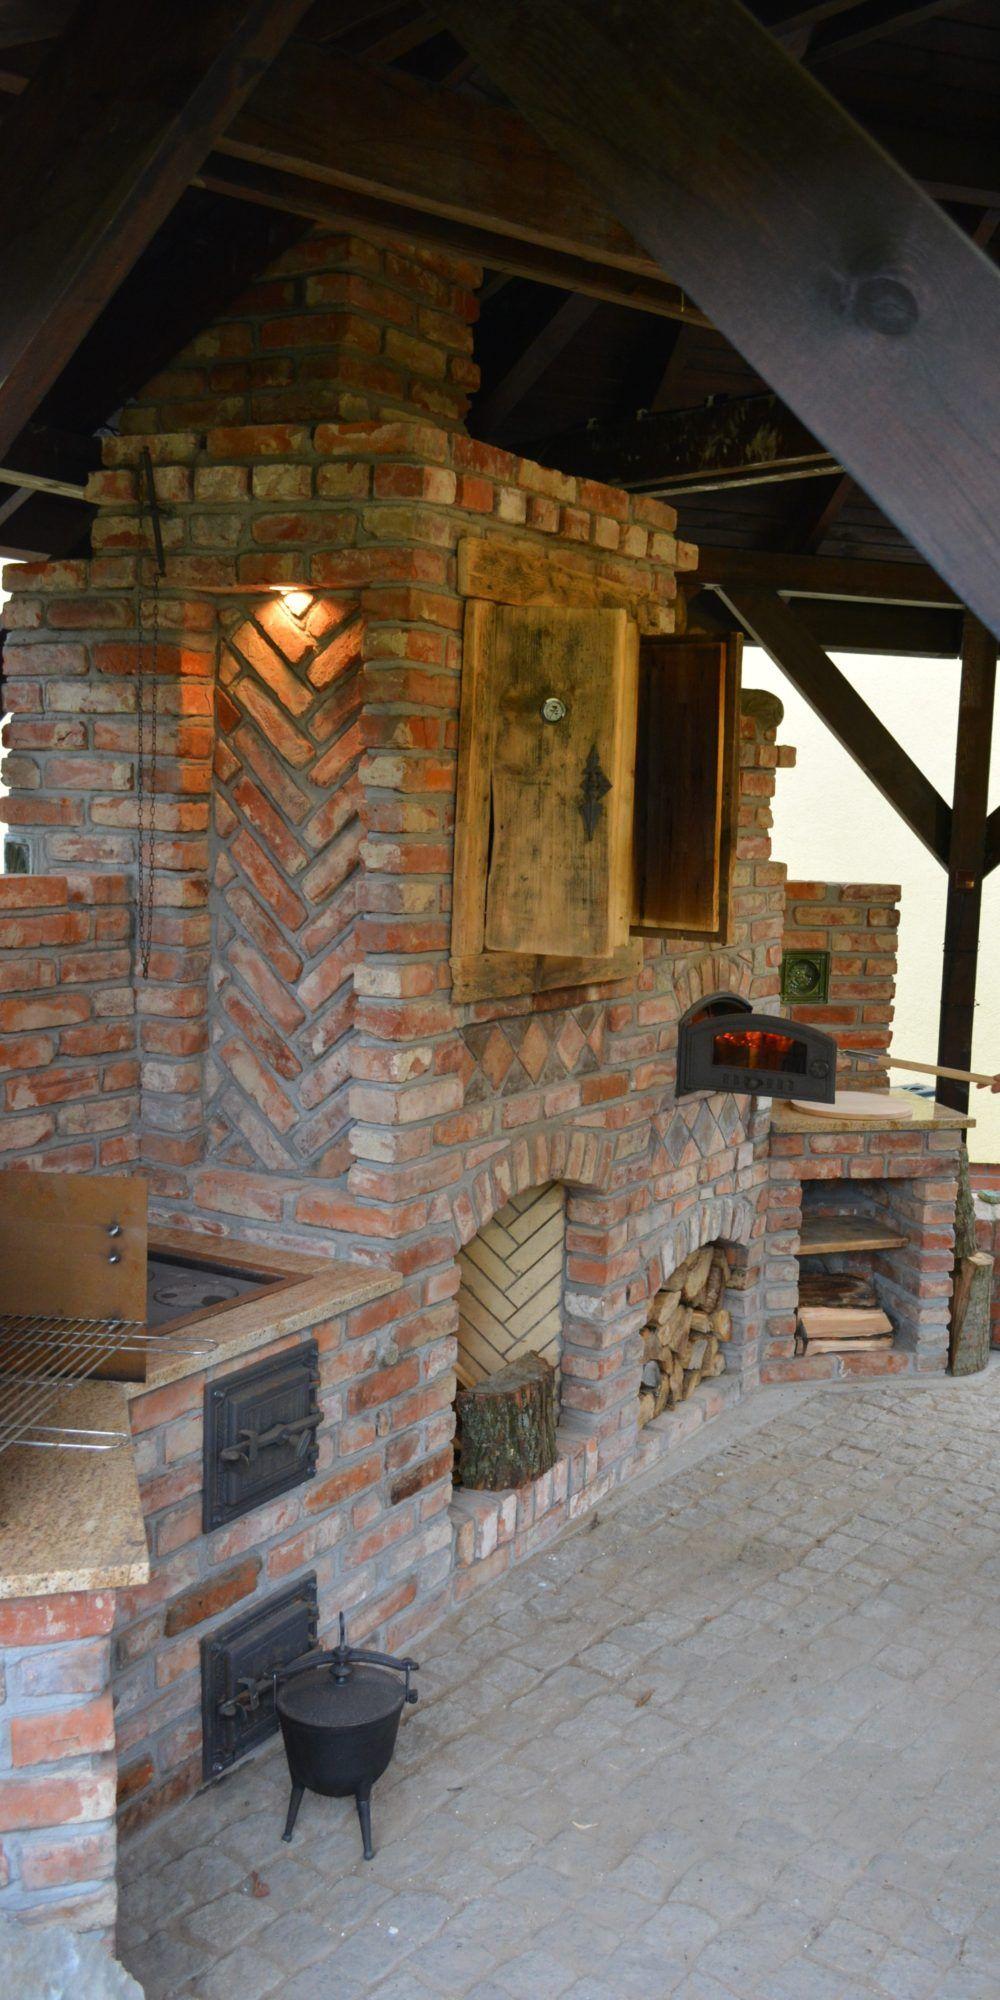 Kuchnie Ze Starej Cegly Kuchnie Letnie Ogrody Zimowe Grille Piece Kuchnia W Ogrodzie Outdoor Kitchen Outdoor Kitchen Decor Fireplace Cooking